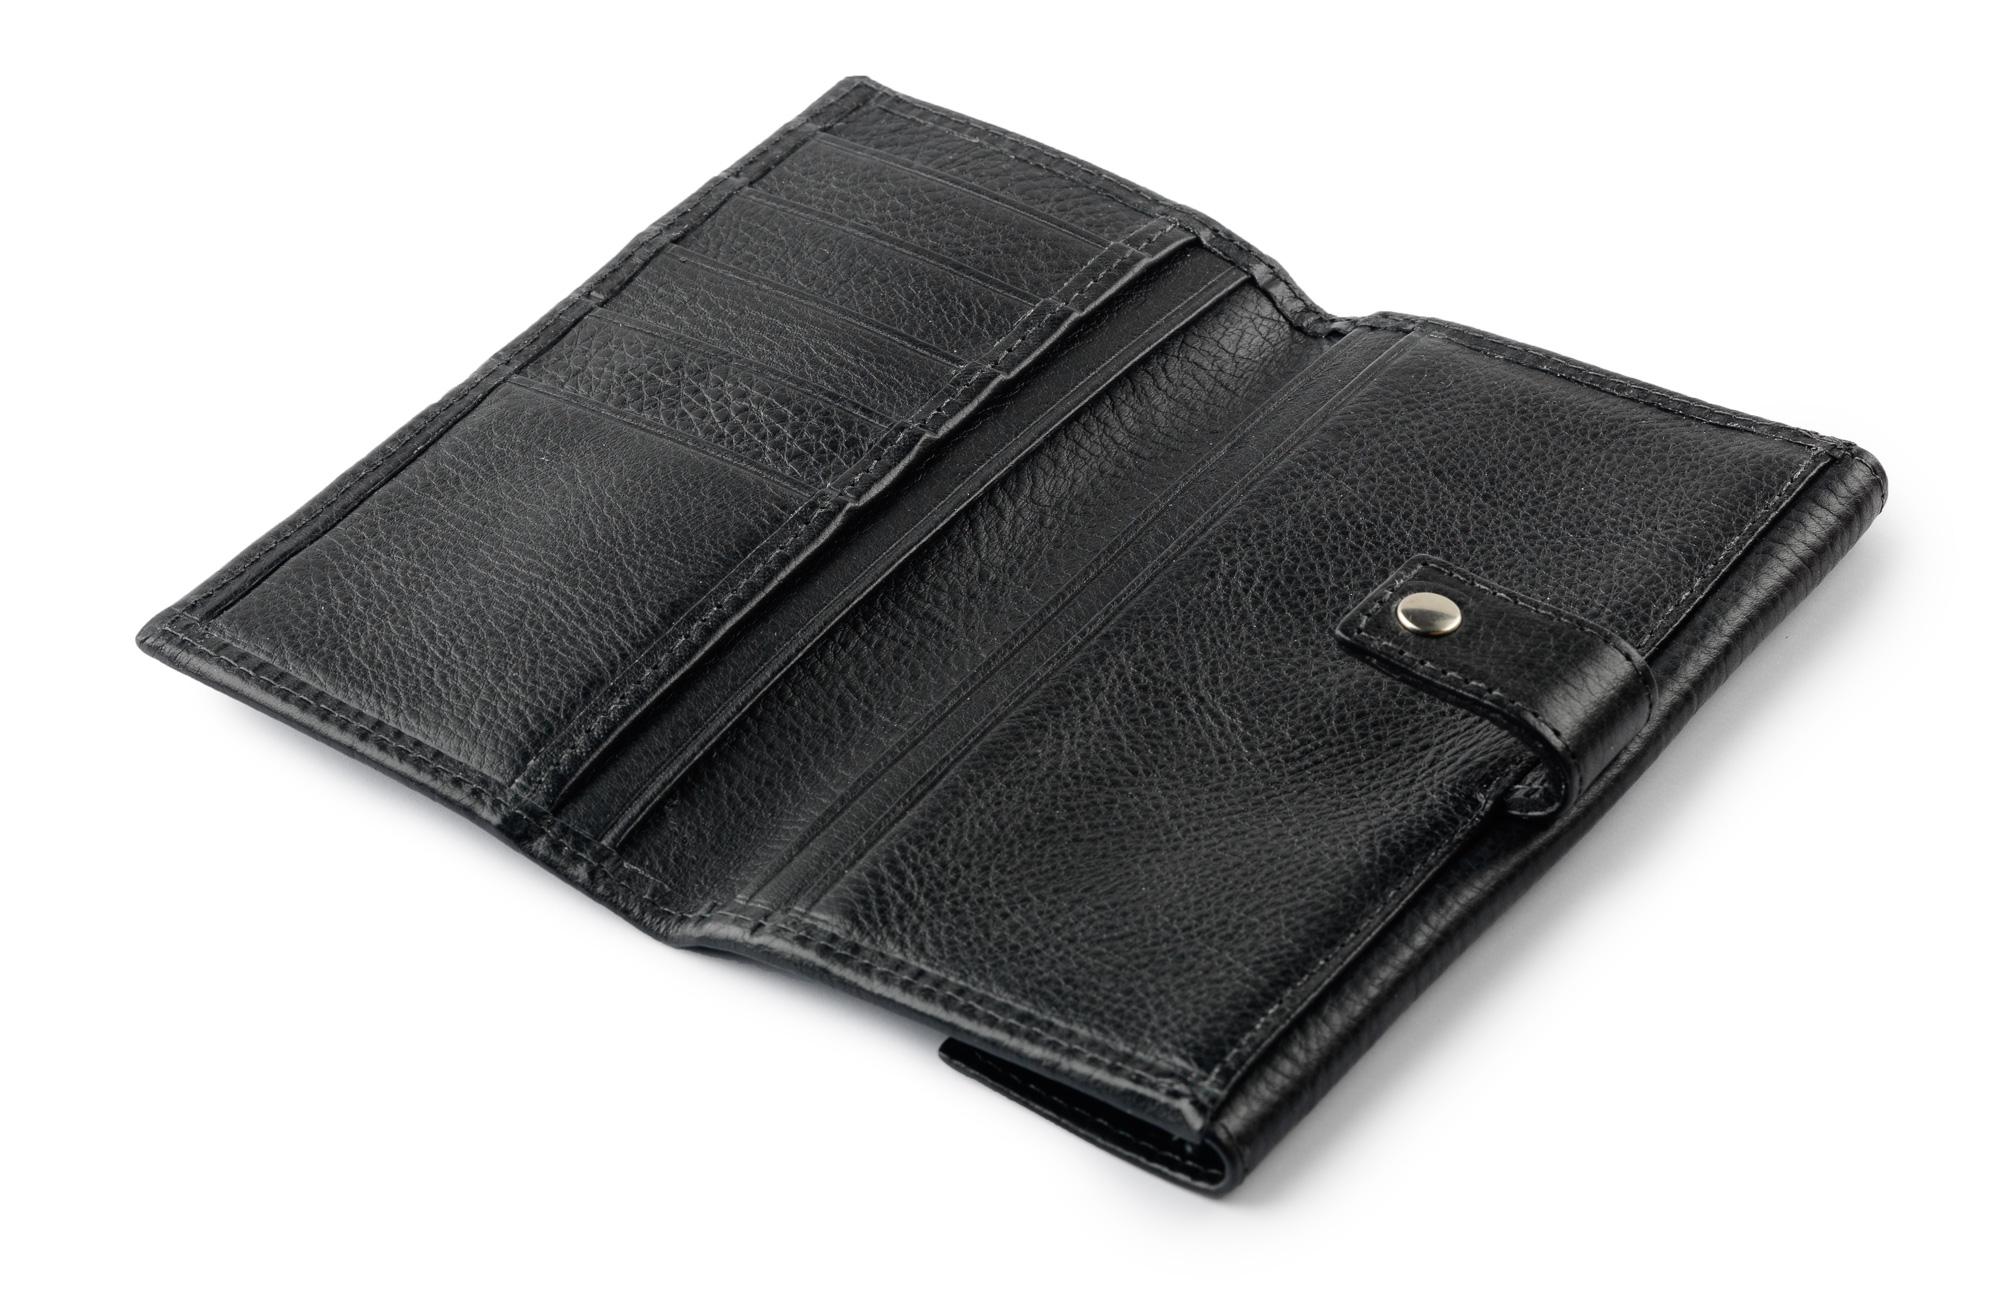 Holden Ladies Leather Wallet Black Inside Copy QC.jpg